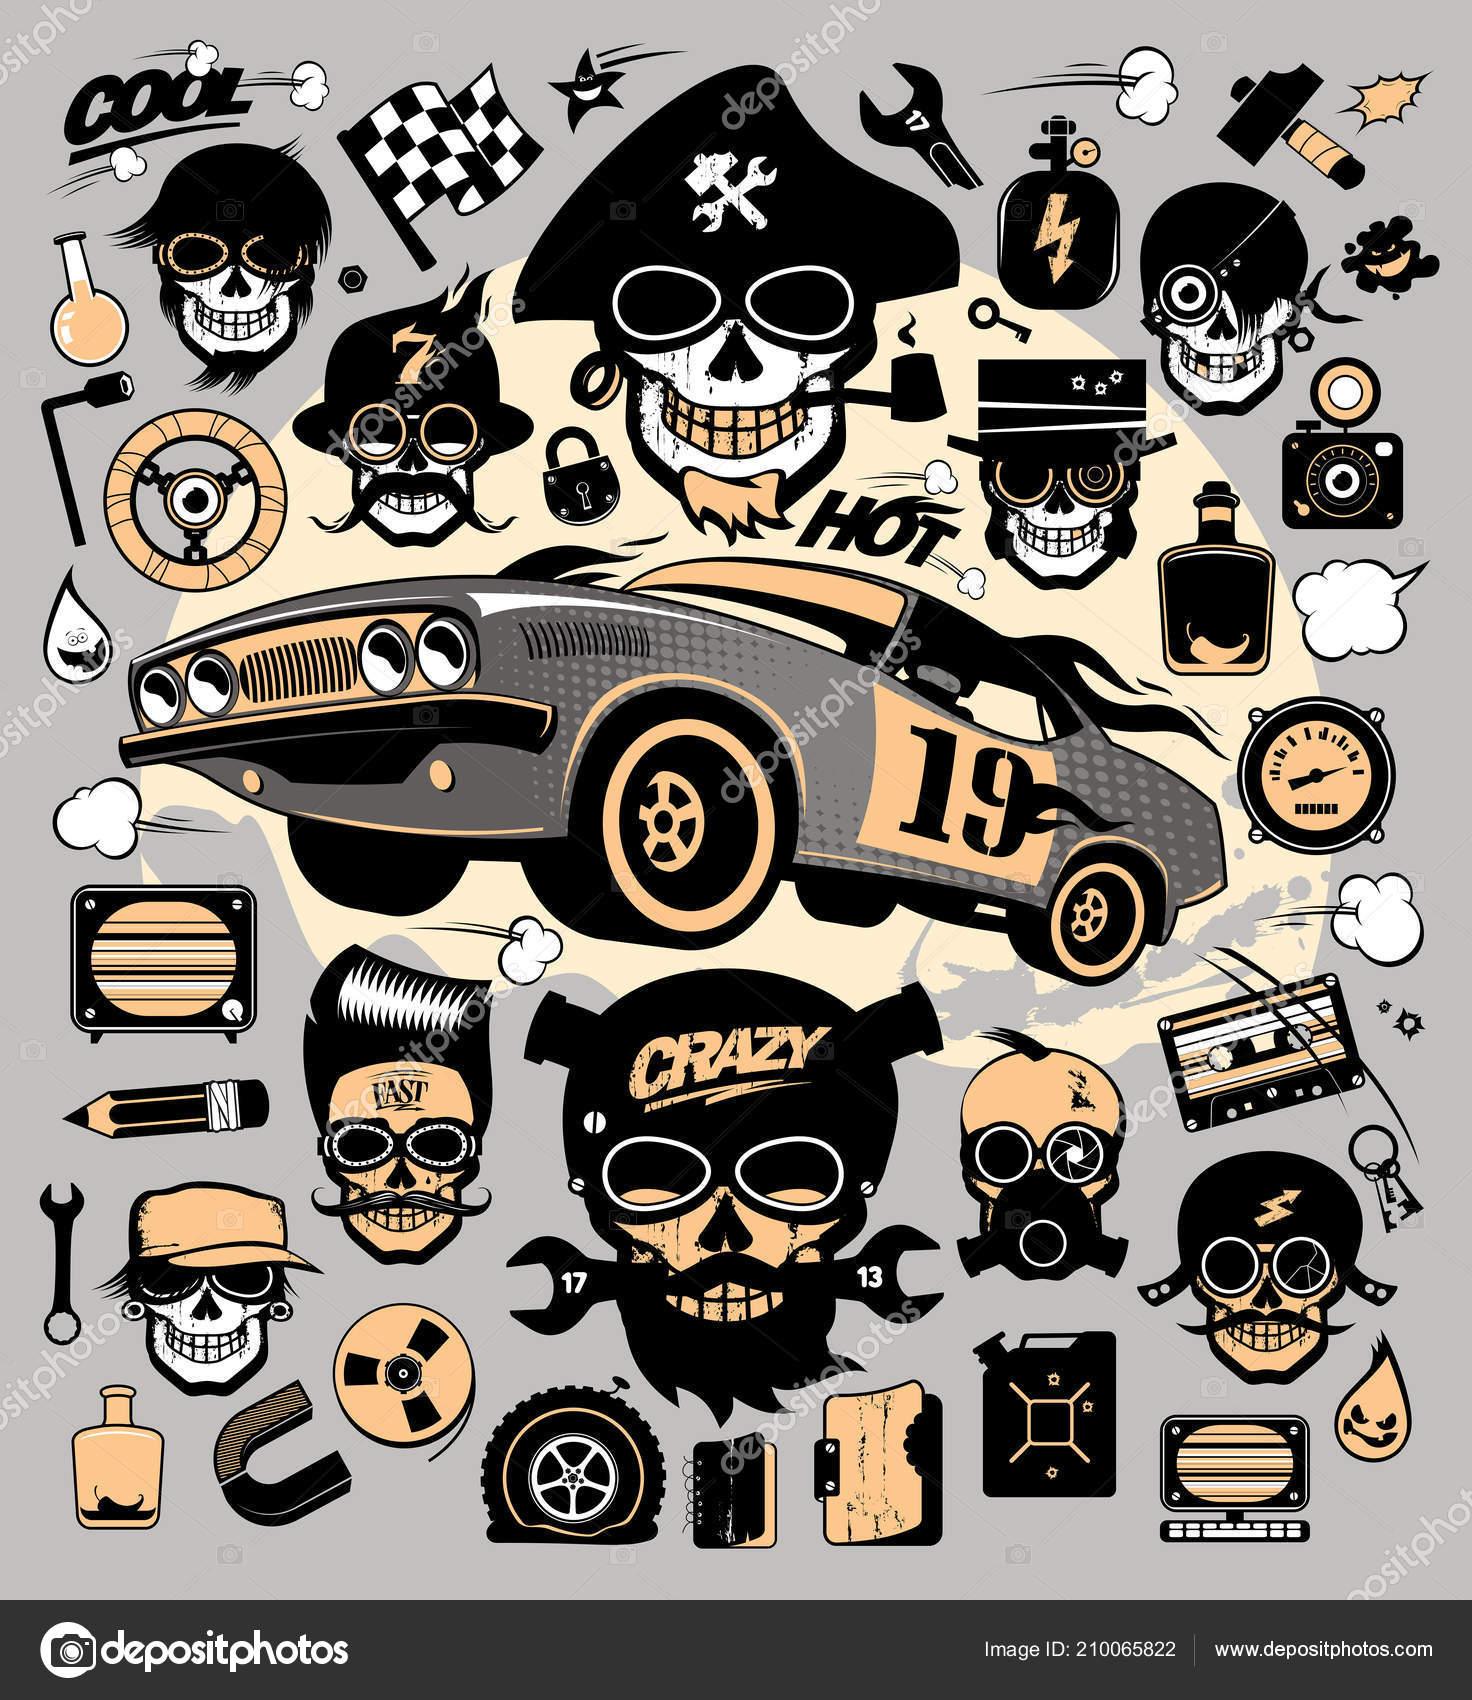 Set Icons Symbols Race Car Repair Tools Steampunk Monsters Music